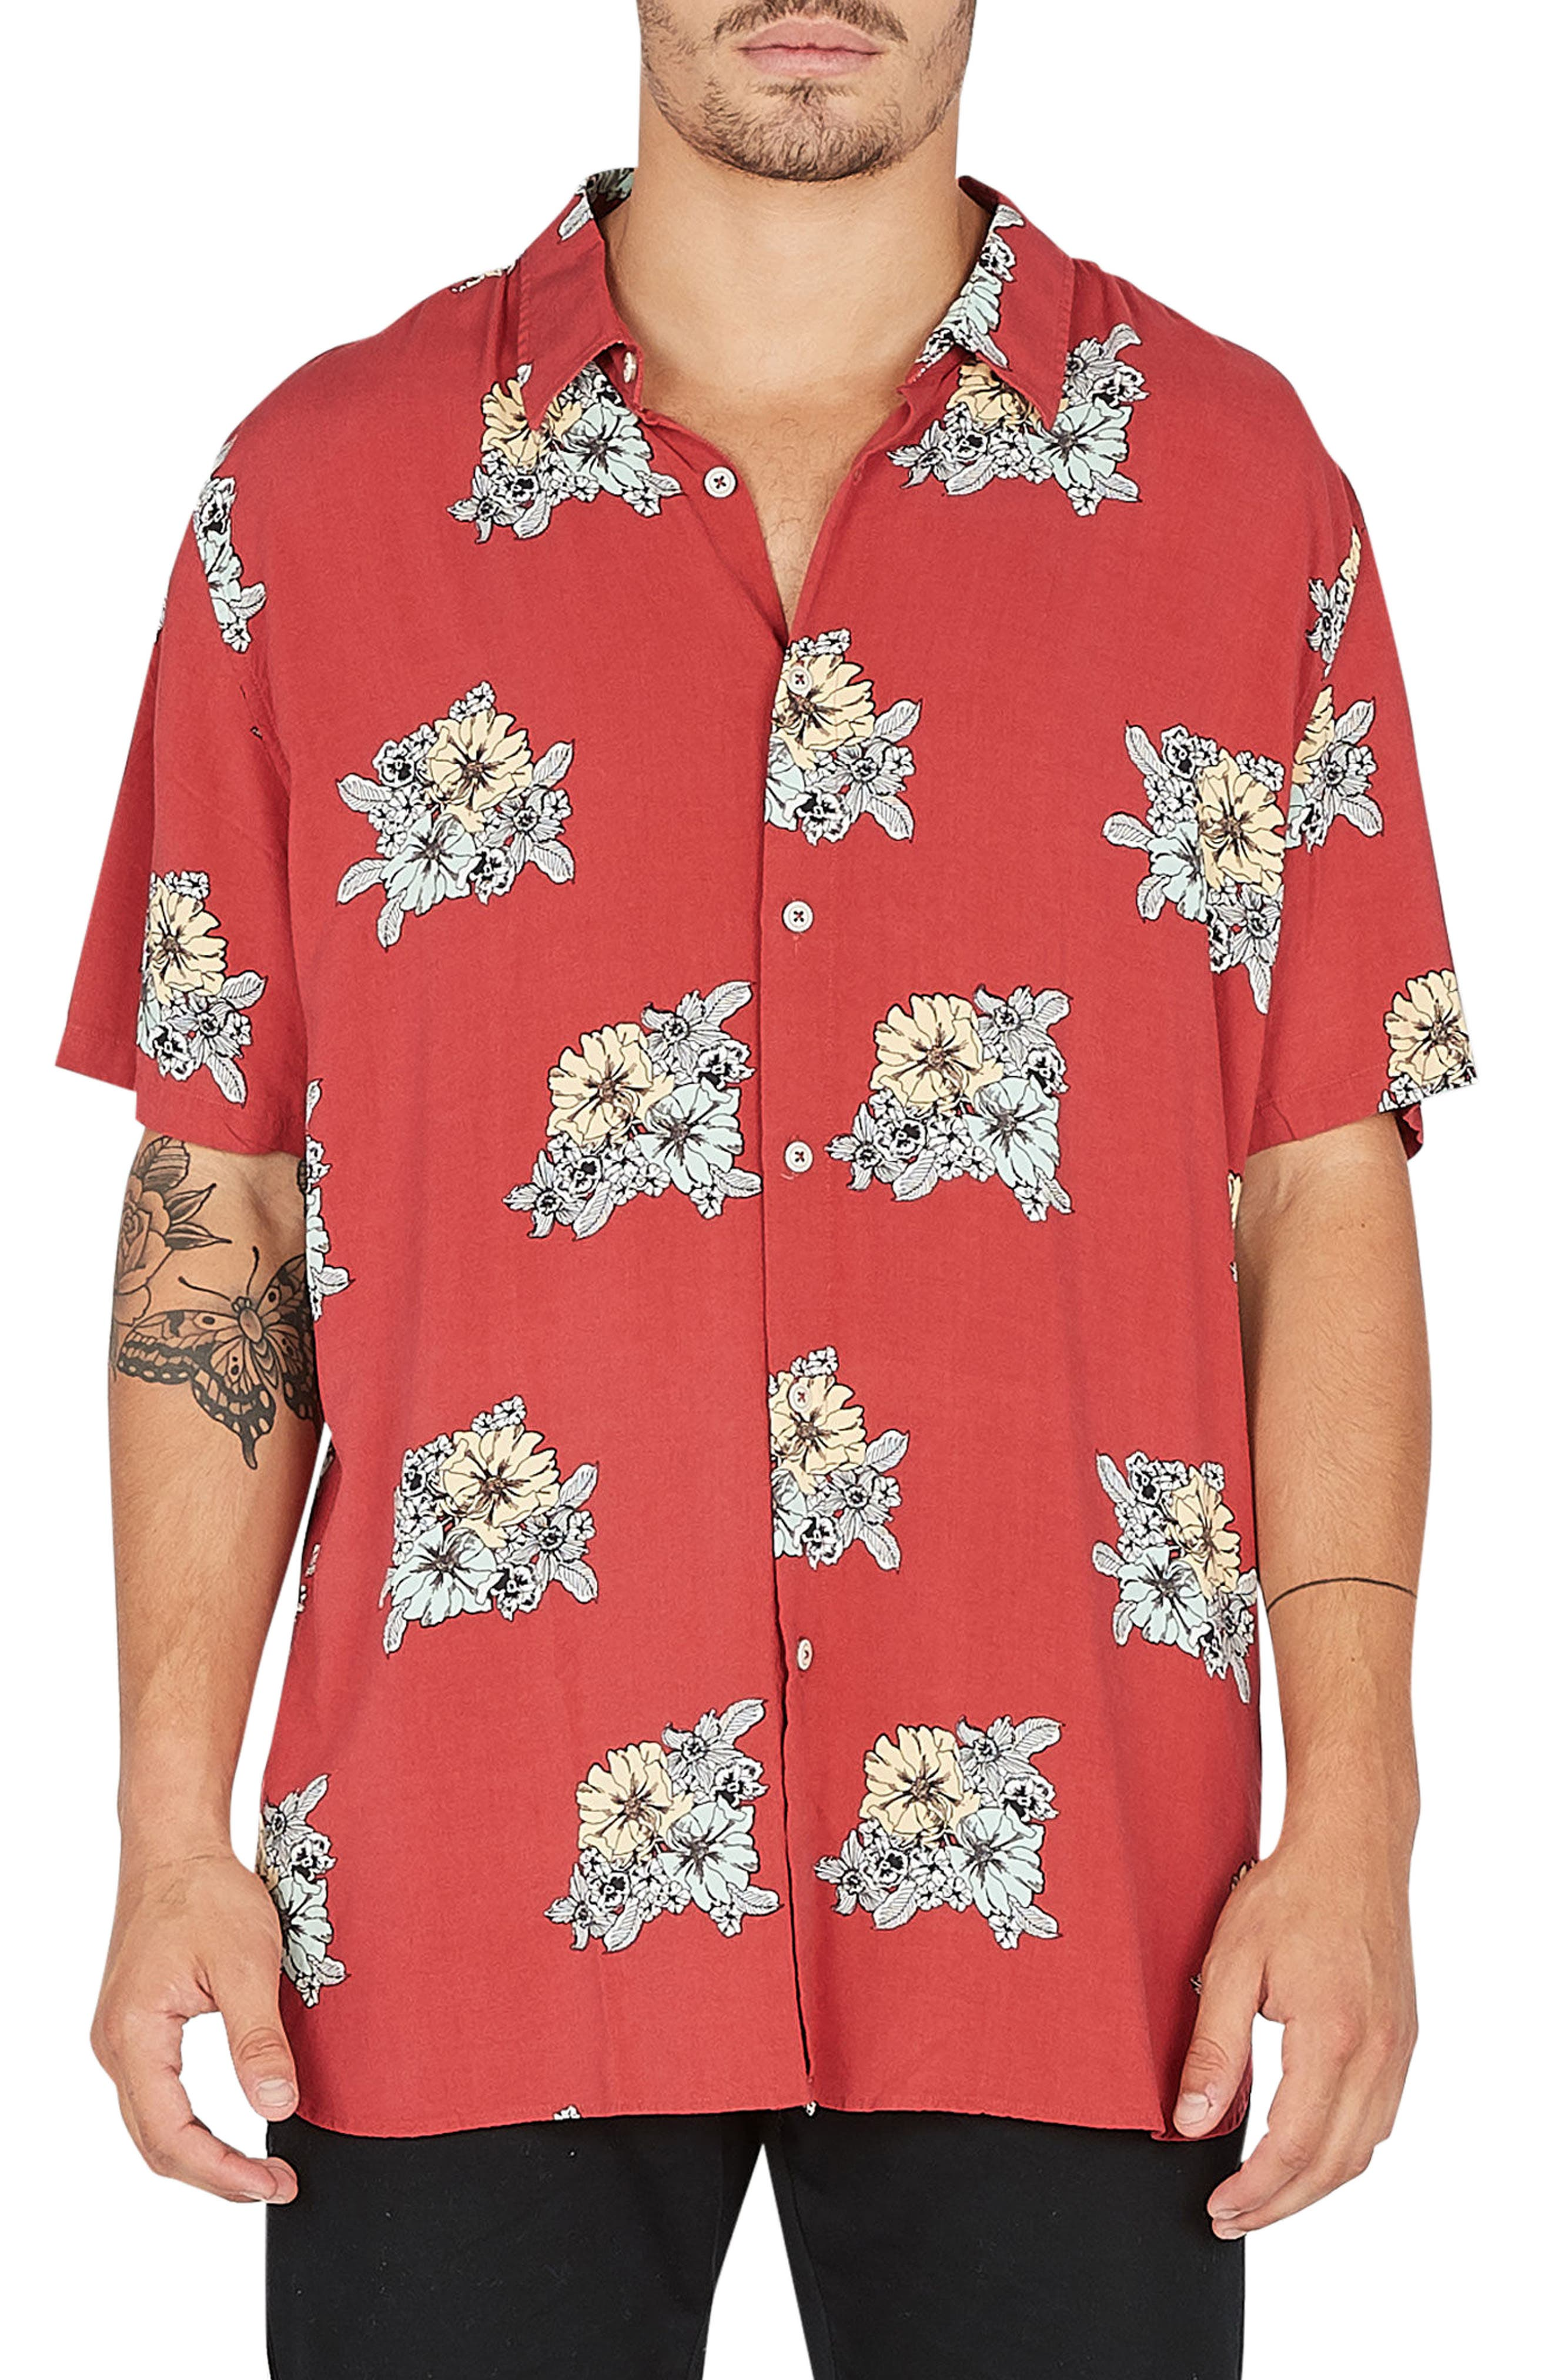 Barney Cools Holiday Woven Shirt